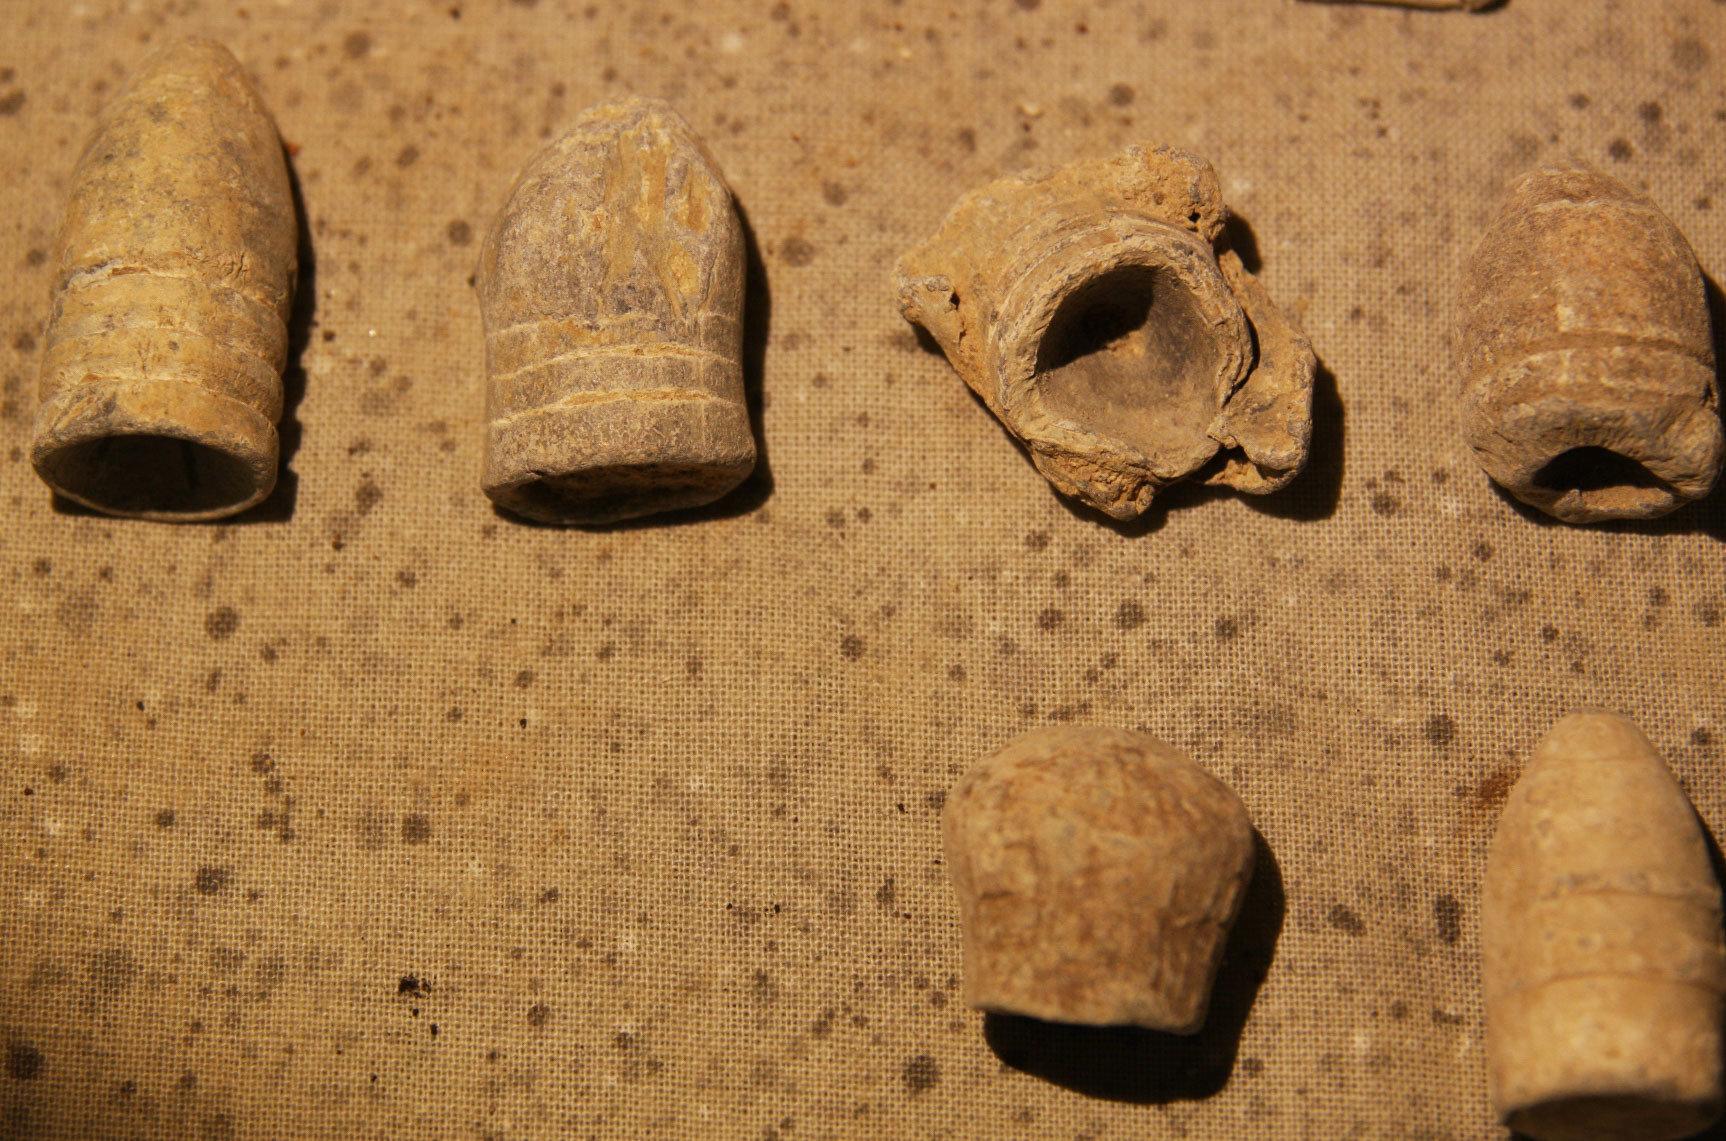 JUST ADDED ON 6/13 - HENRY DEEKS COLLECTION - 20 Bullets Including Carved, Gardner, Swage, Mushroomed, .69, Pulled